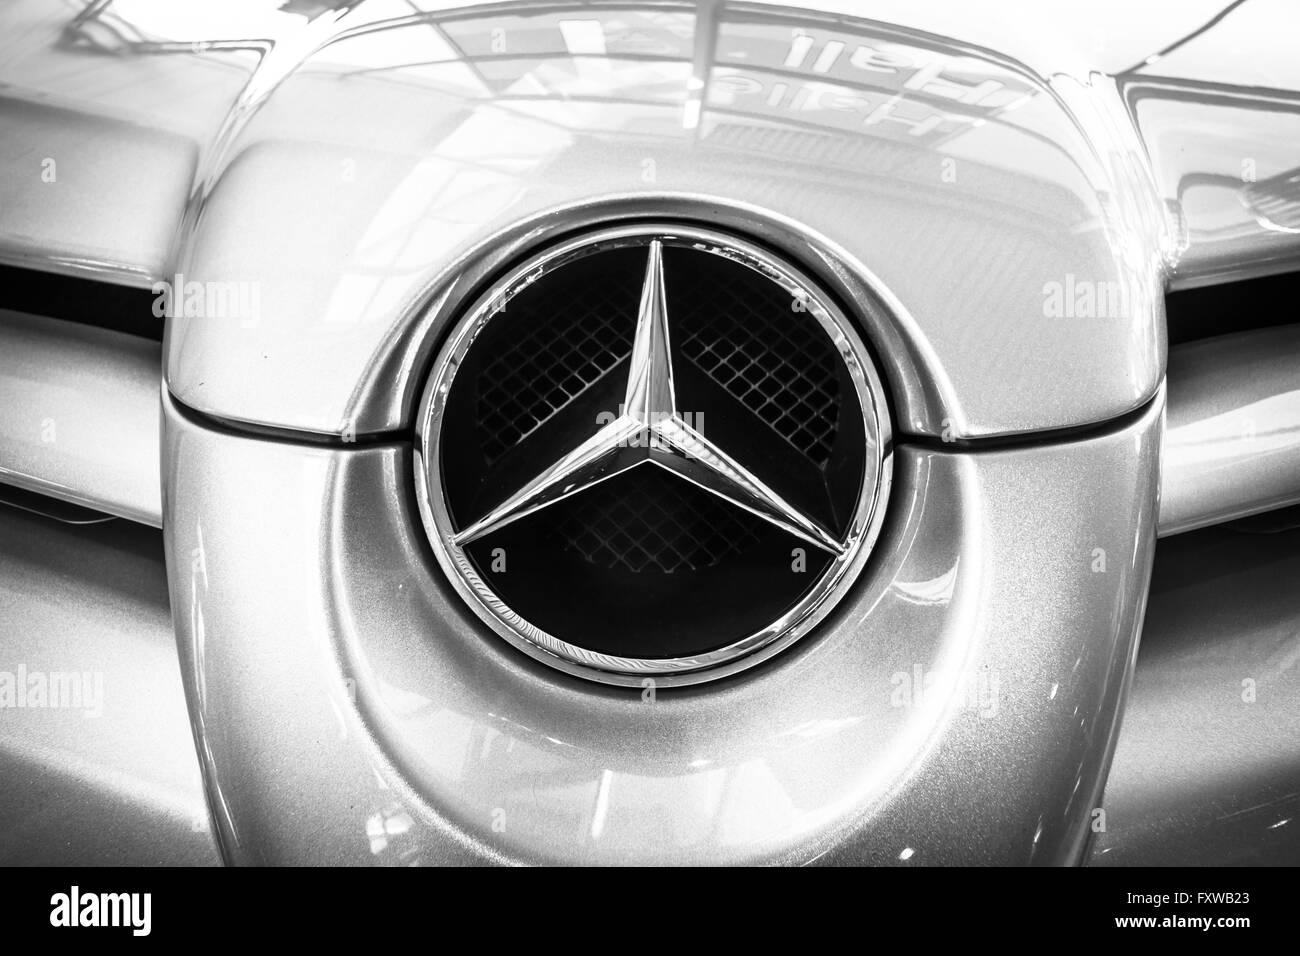 Fragment of a grand tourer car Mercedes-Benz SLR McLaren, 2006 - Stock Image